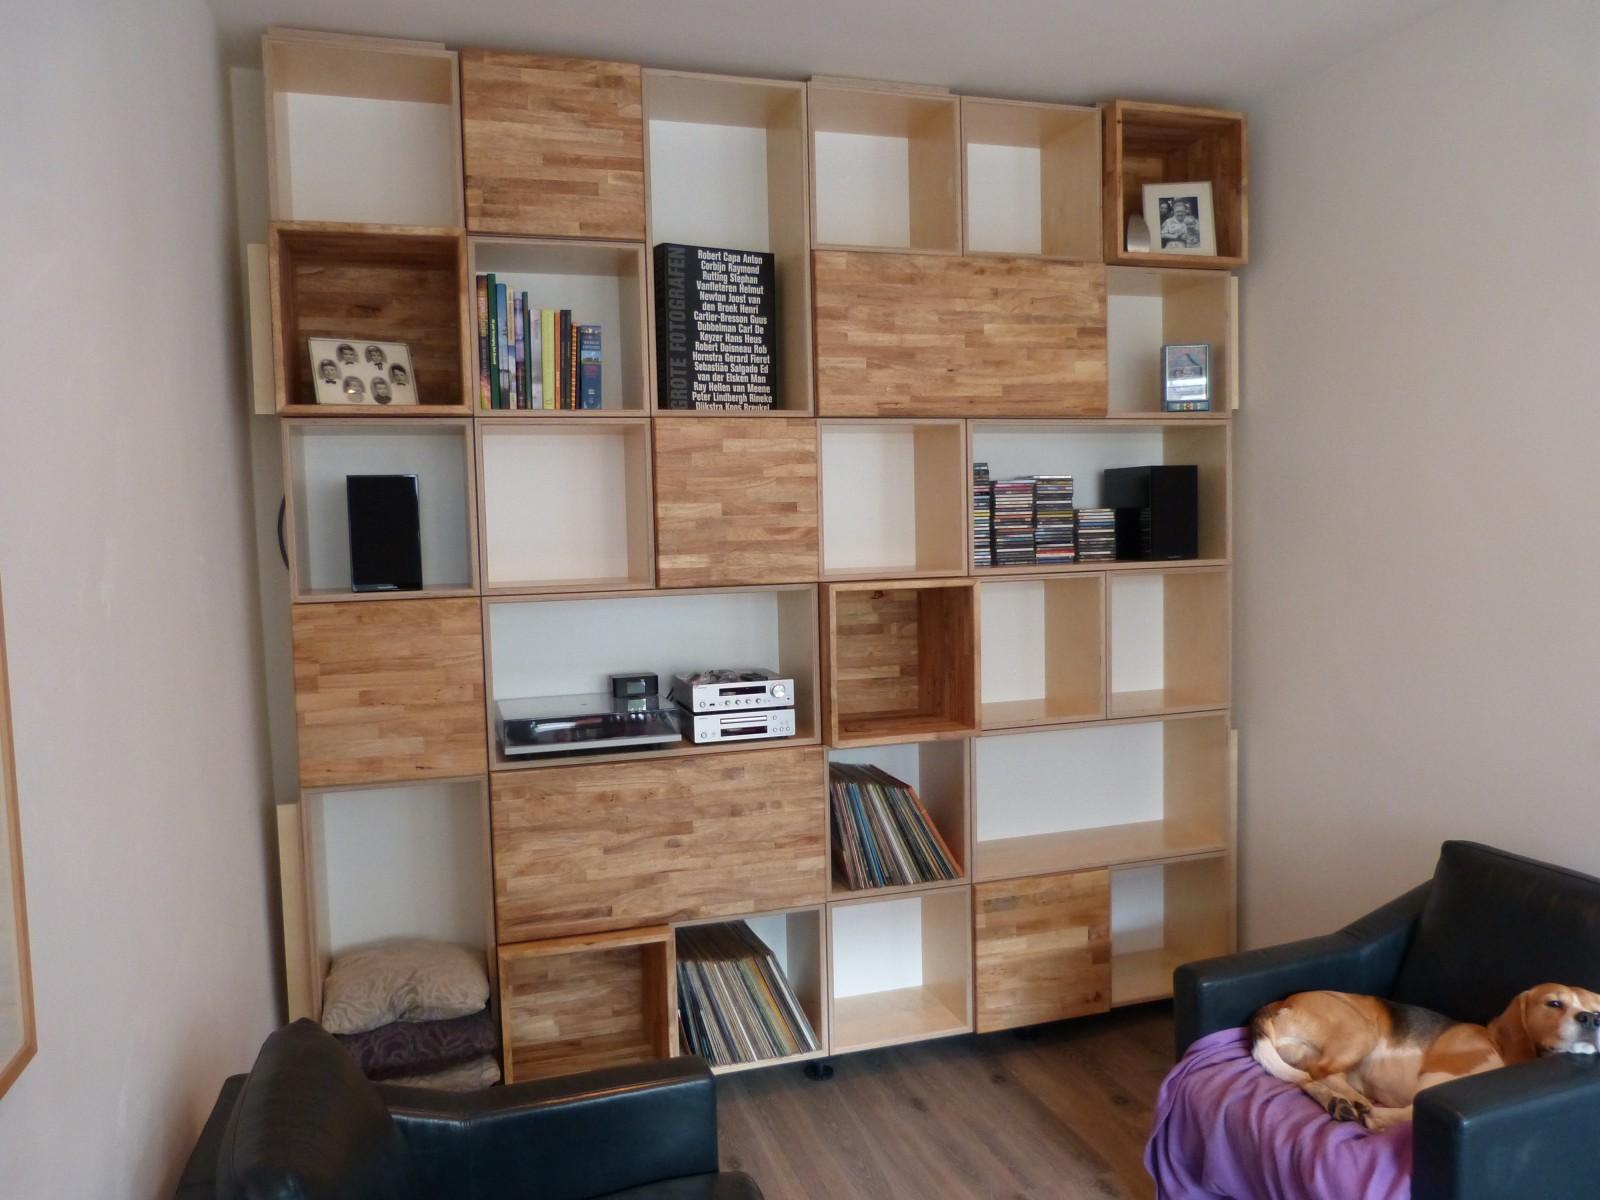 kubuskast wandmeubel boekenkast Deuvel Design 5